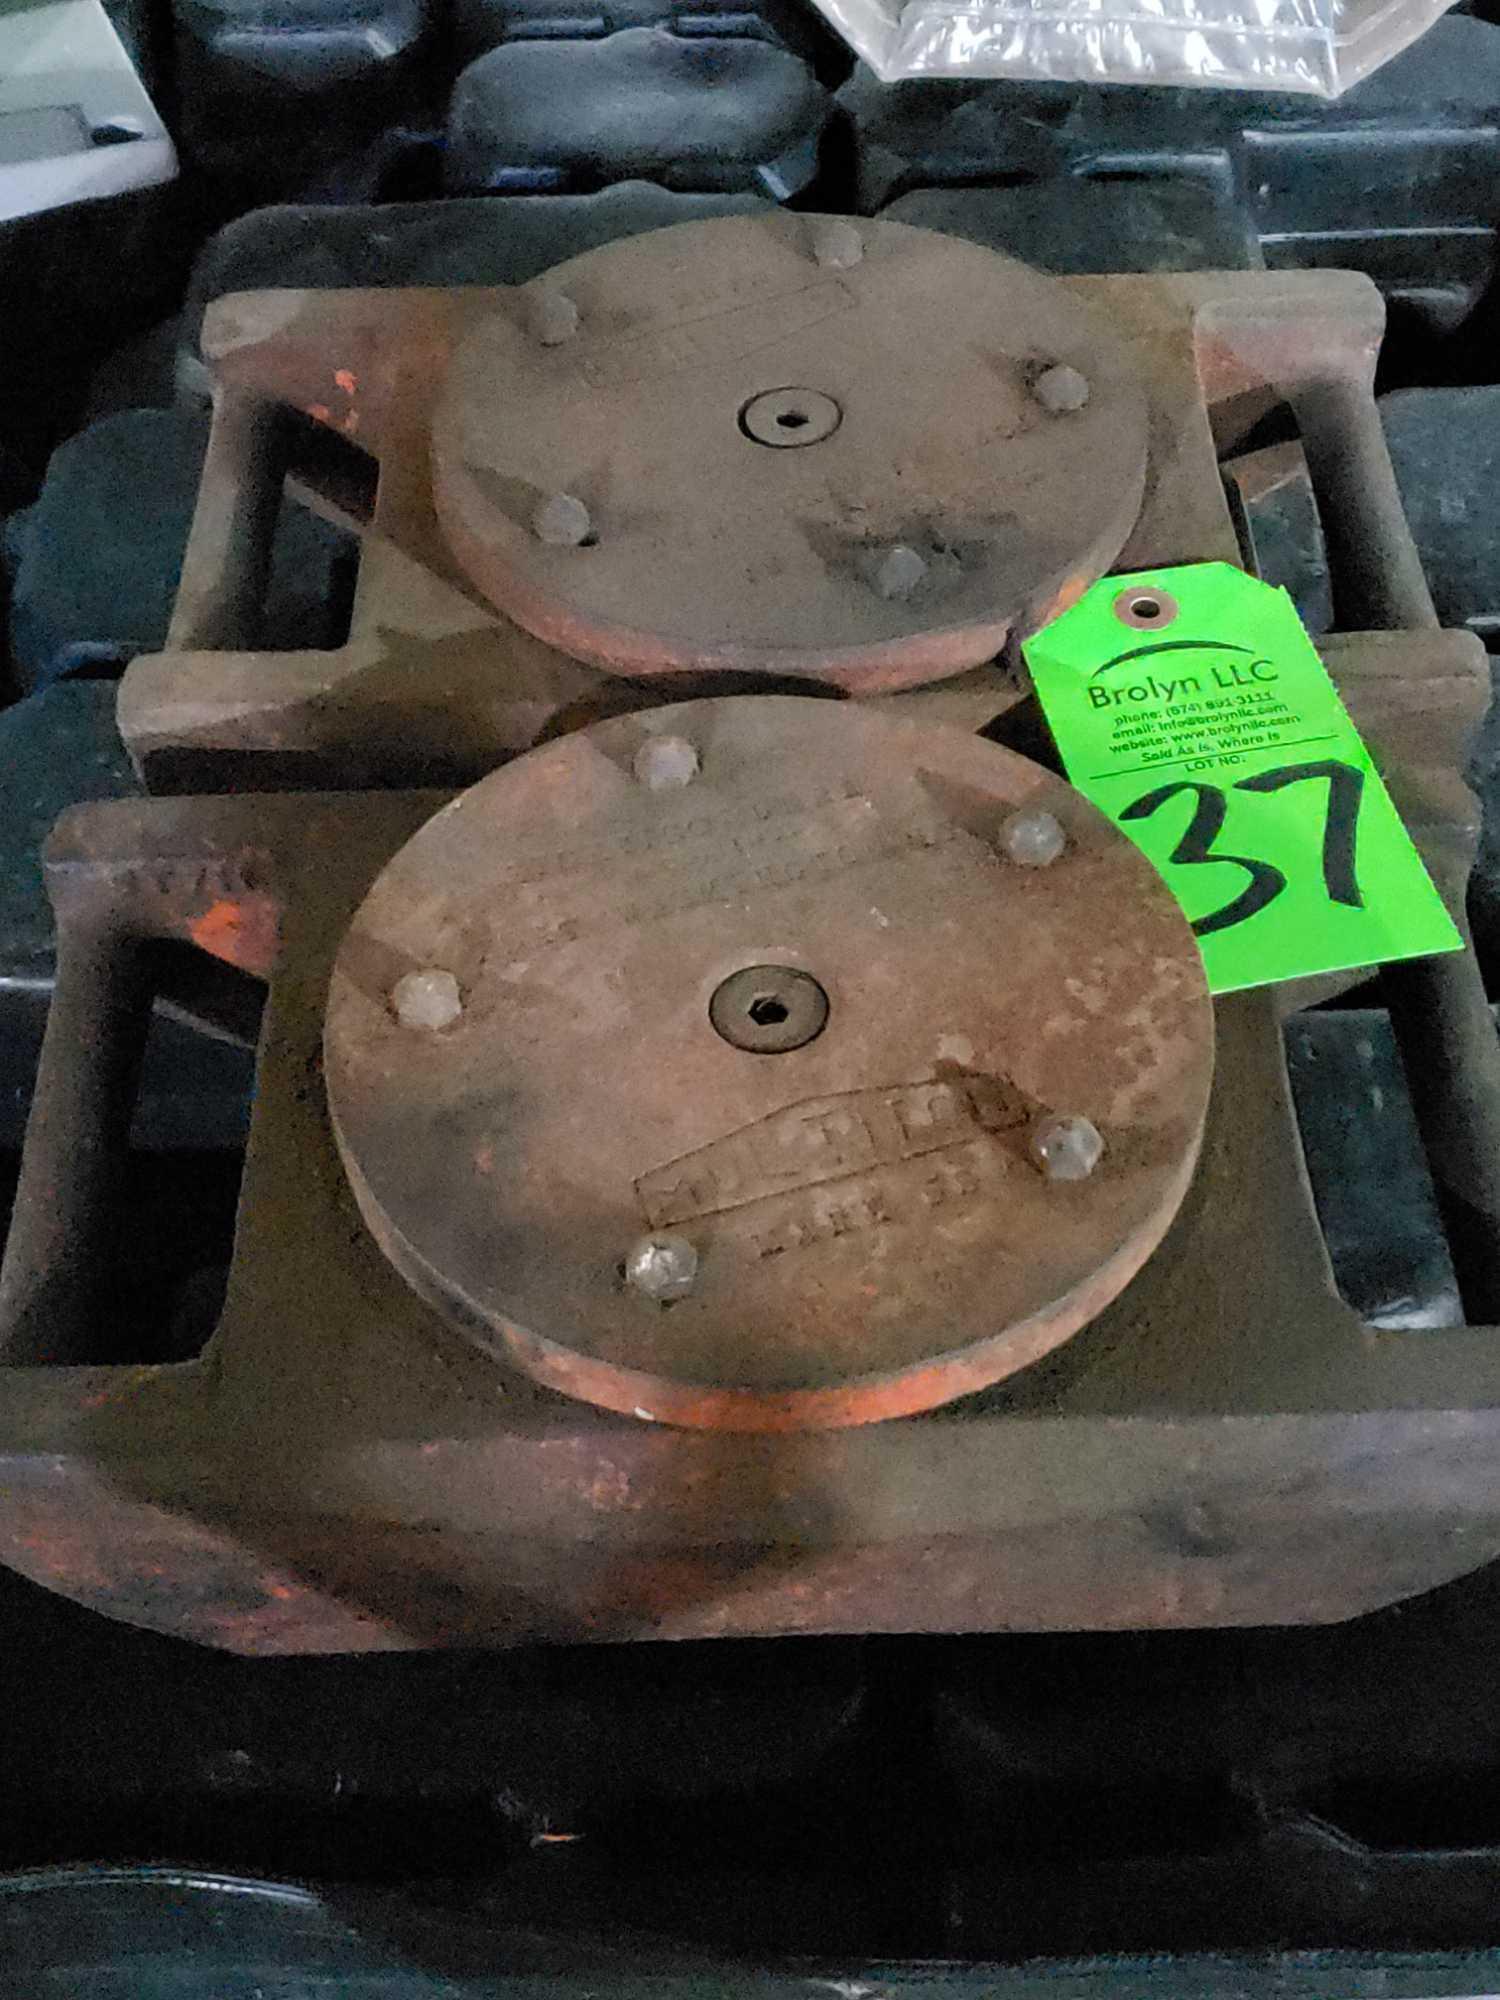 Lot 37 - Qty 2 - MultiTon machine skates